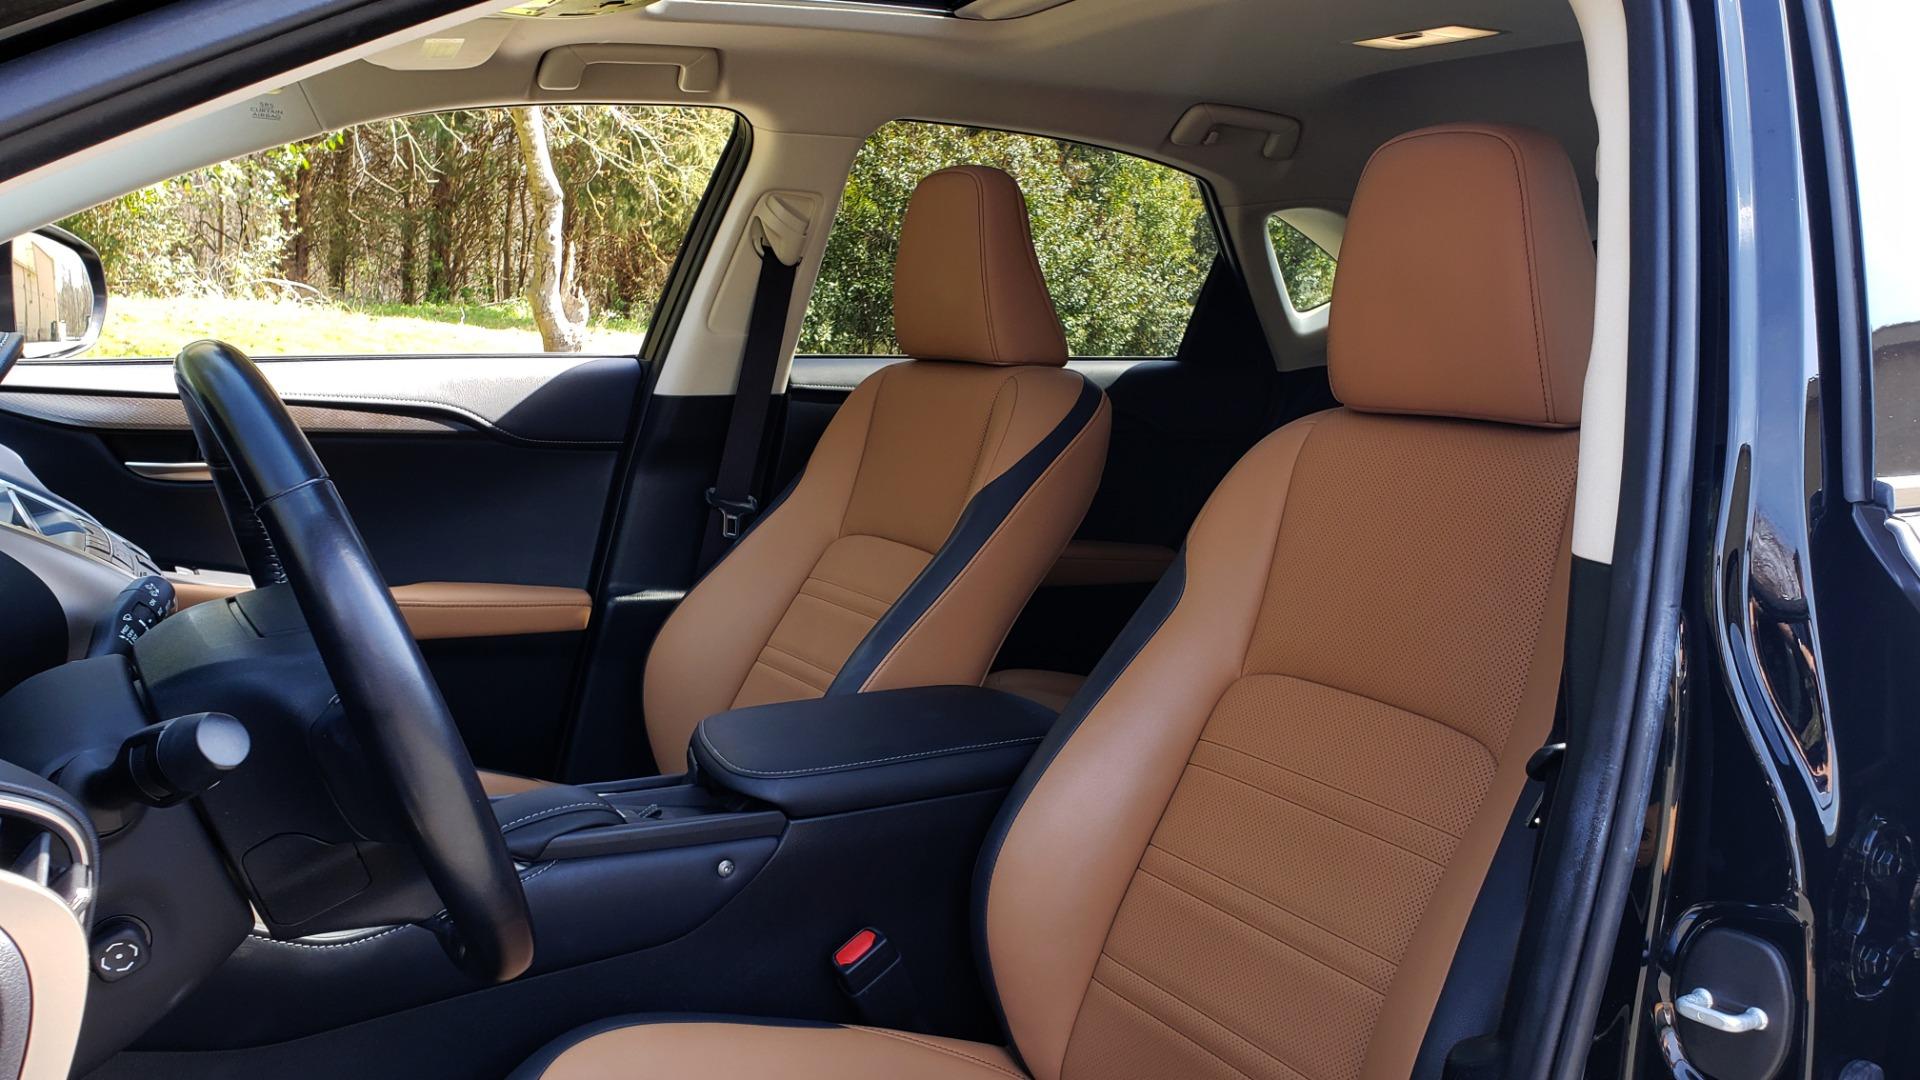 Used 2016 Lexus NX 200T PREM PKG / NAV / SUNROOF / PRE-COLLISION / PARK ASST for sale Sold at Formula Imports in Charlotte NC 28227 34